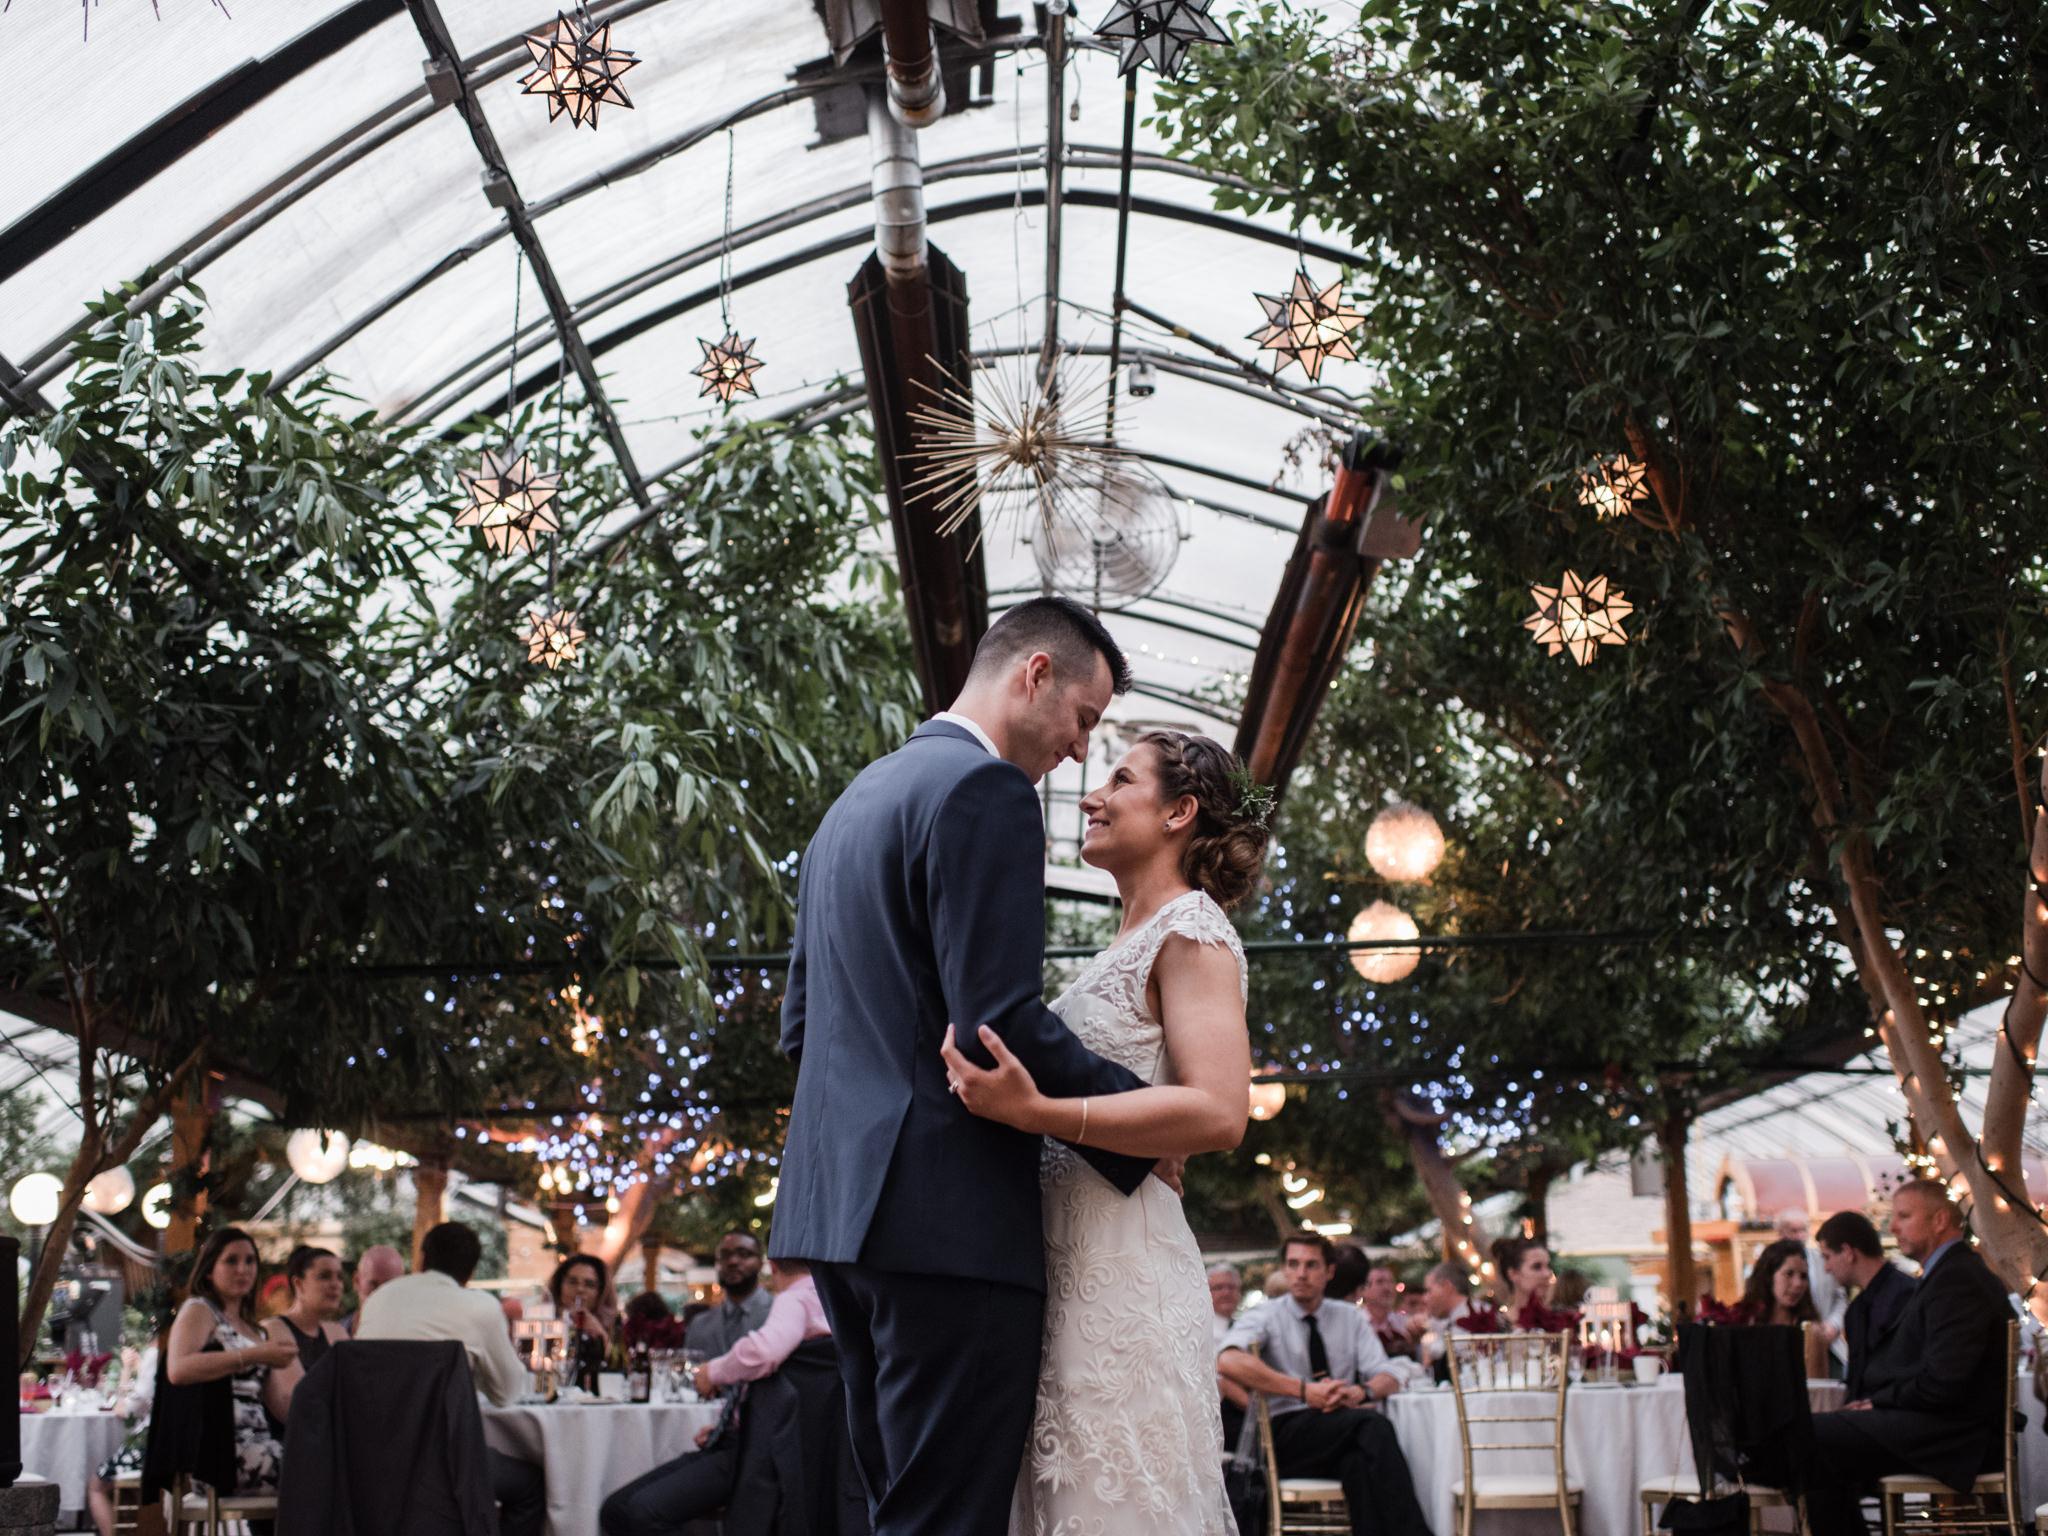 Madsen's greenhouse wedding